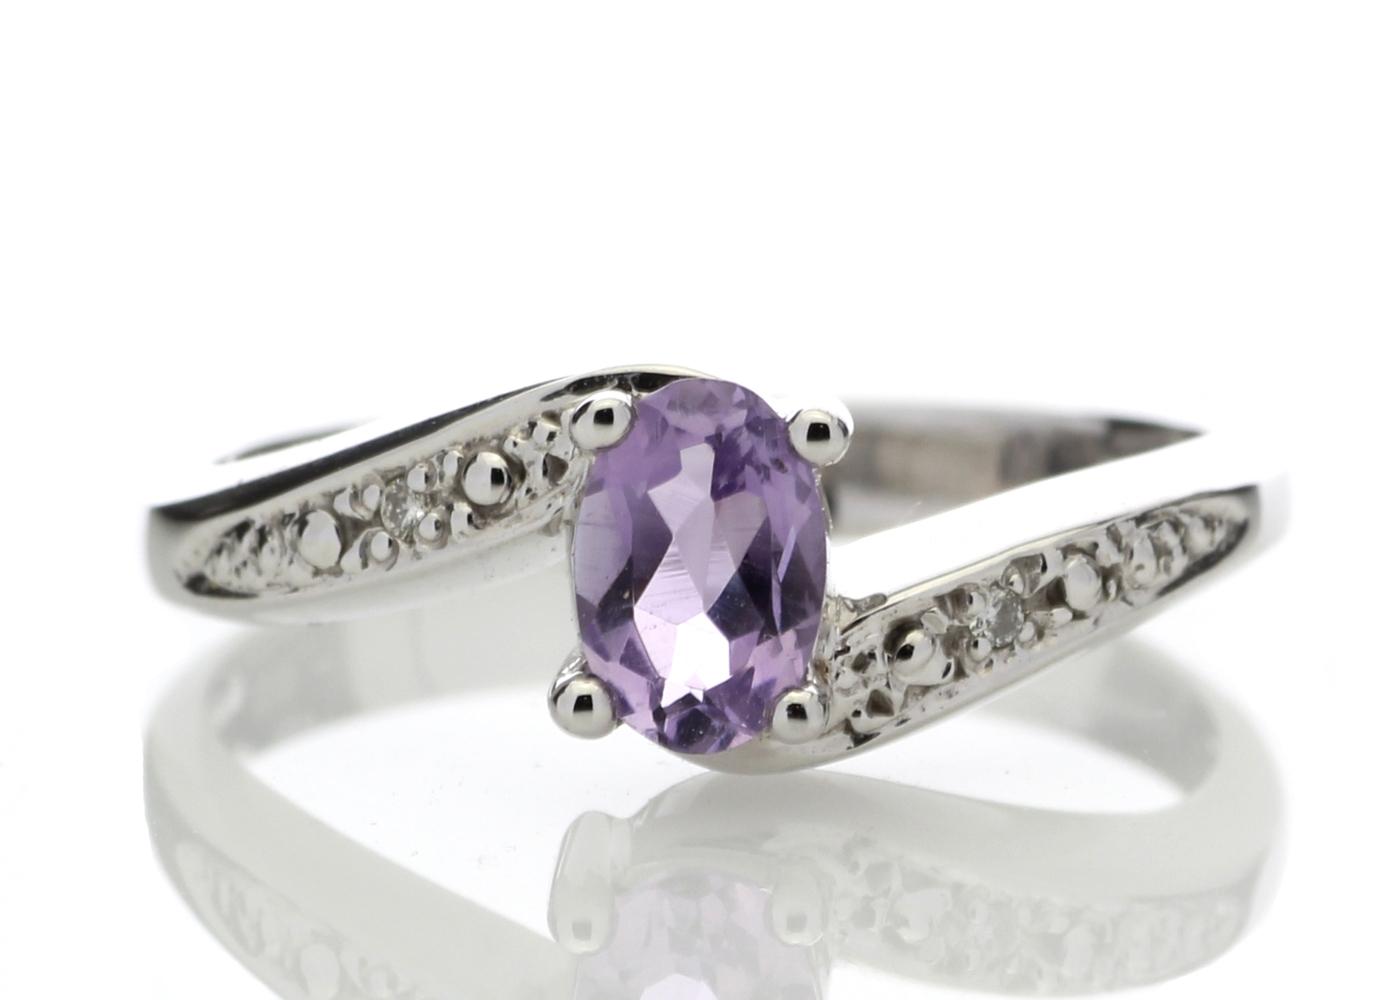 9ct White Gold Amethyst Diamond Ring 0.01 Carats